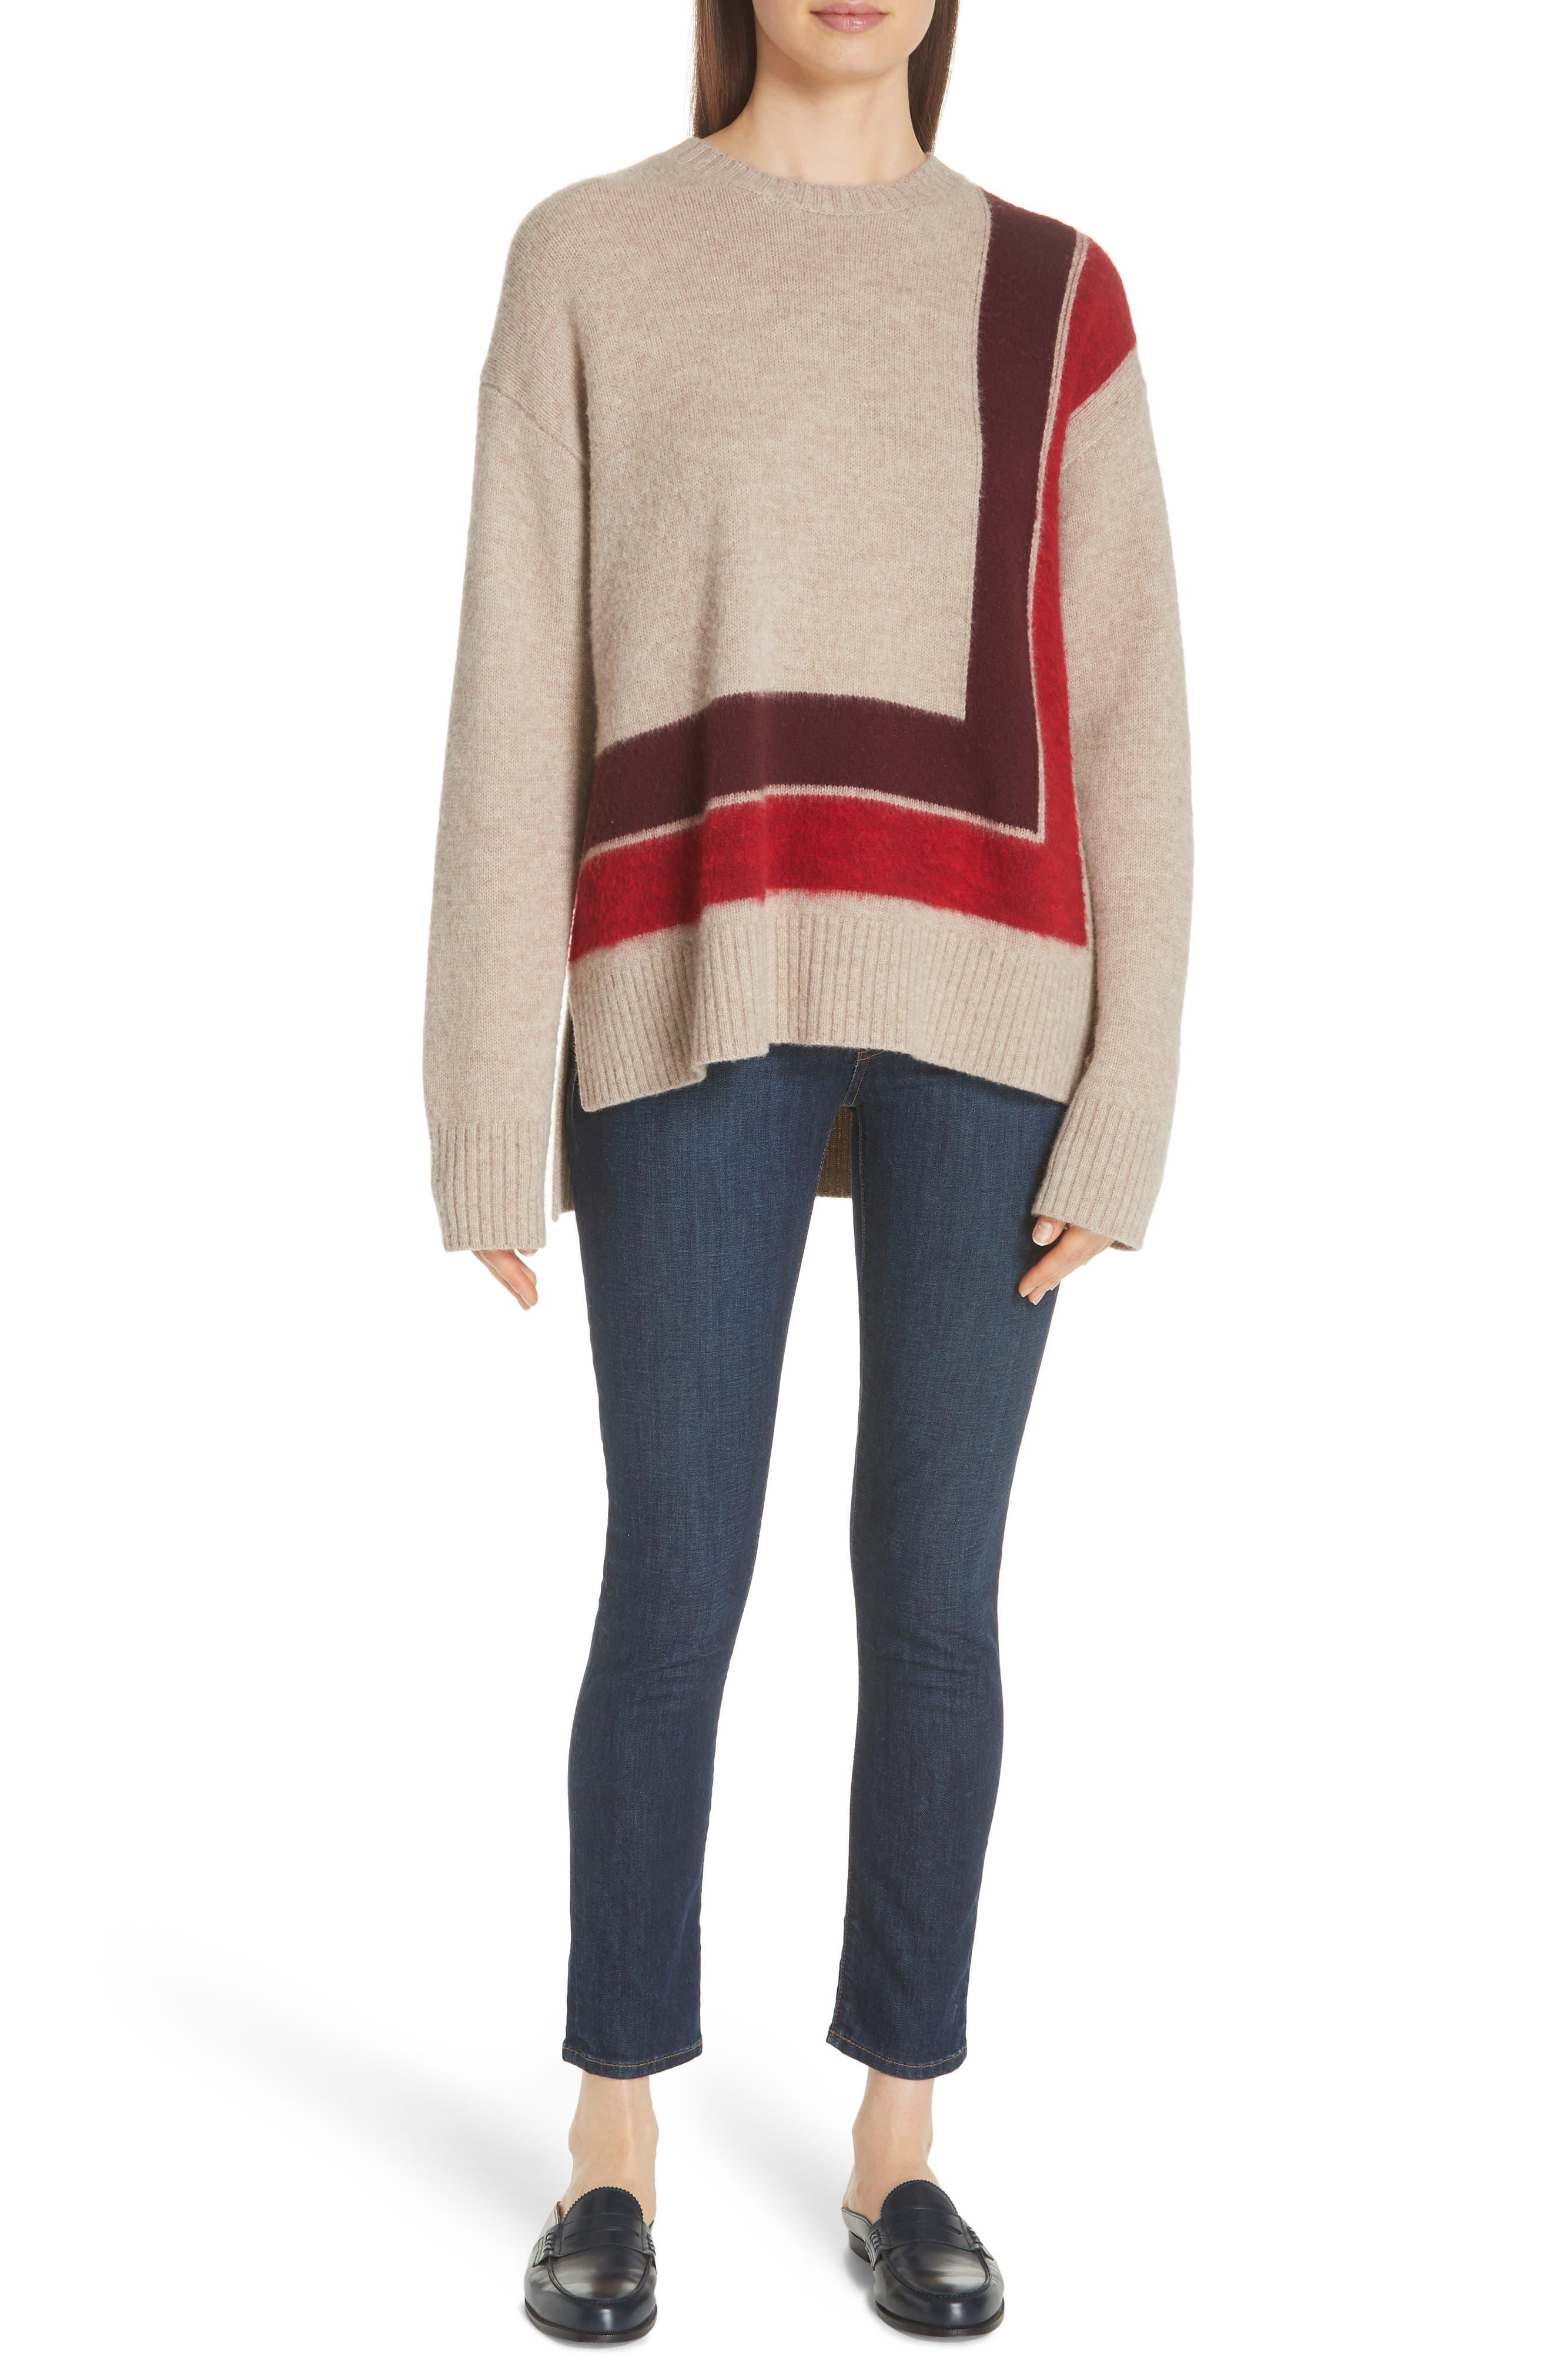 Derek Lam 10 Crosby Crewneck Blanket Sweater, Beige